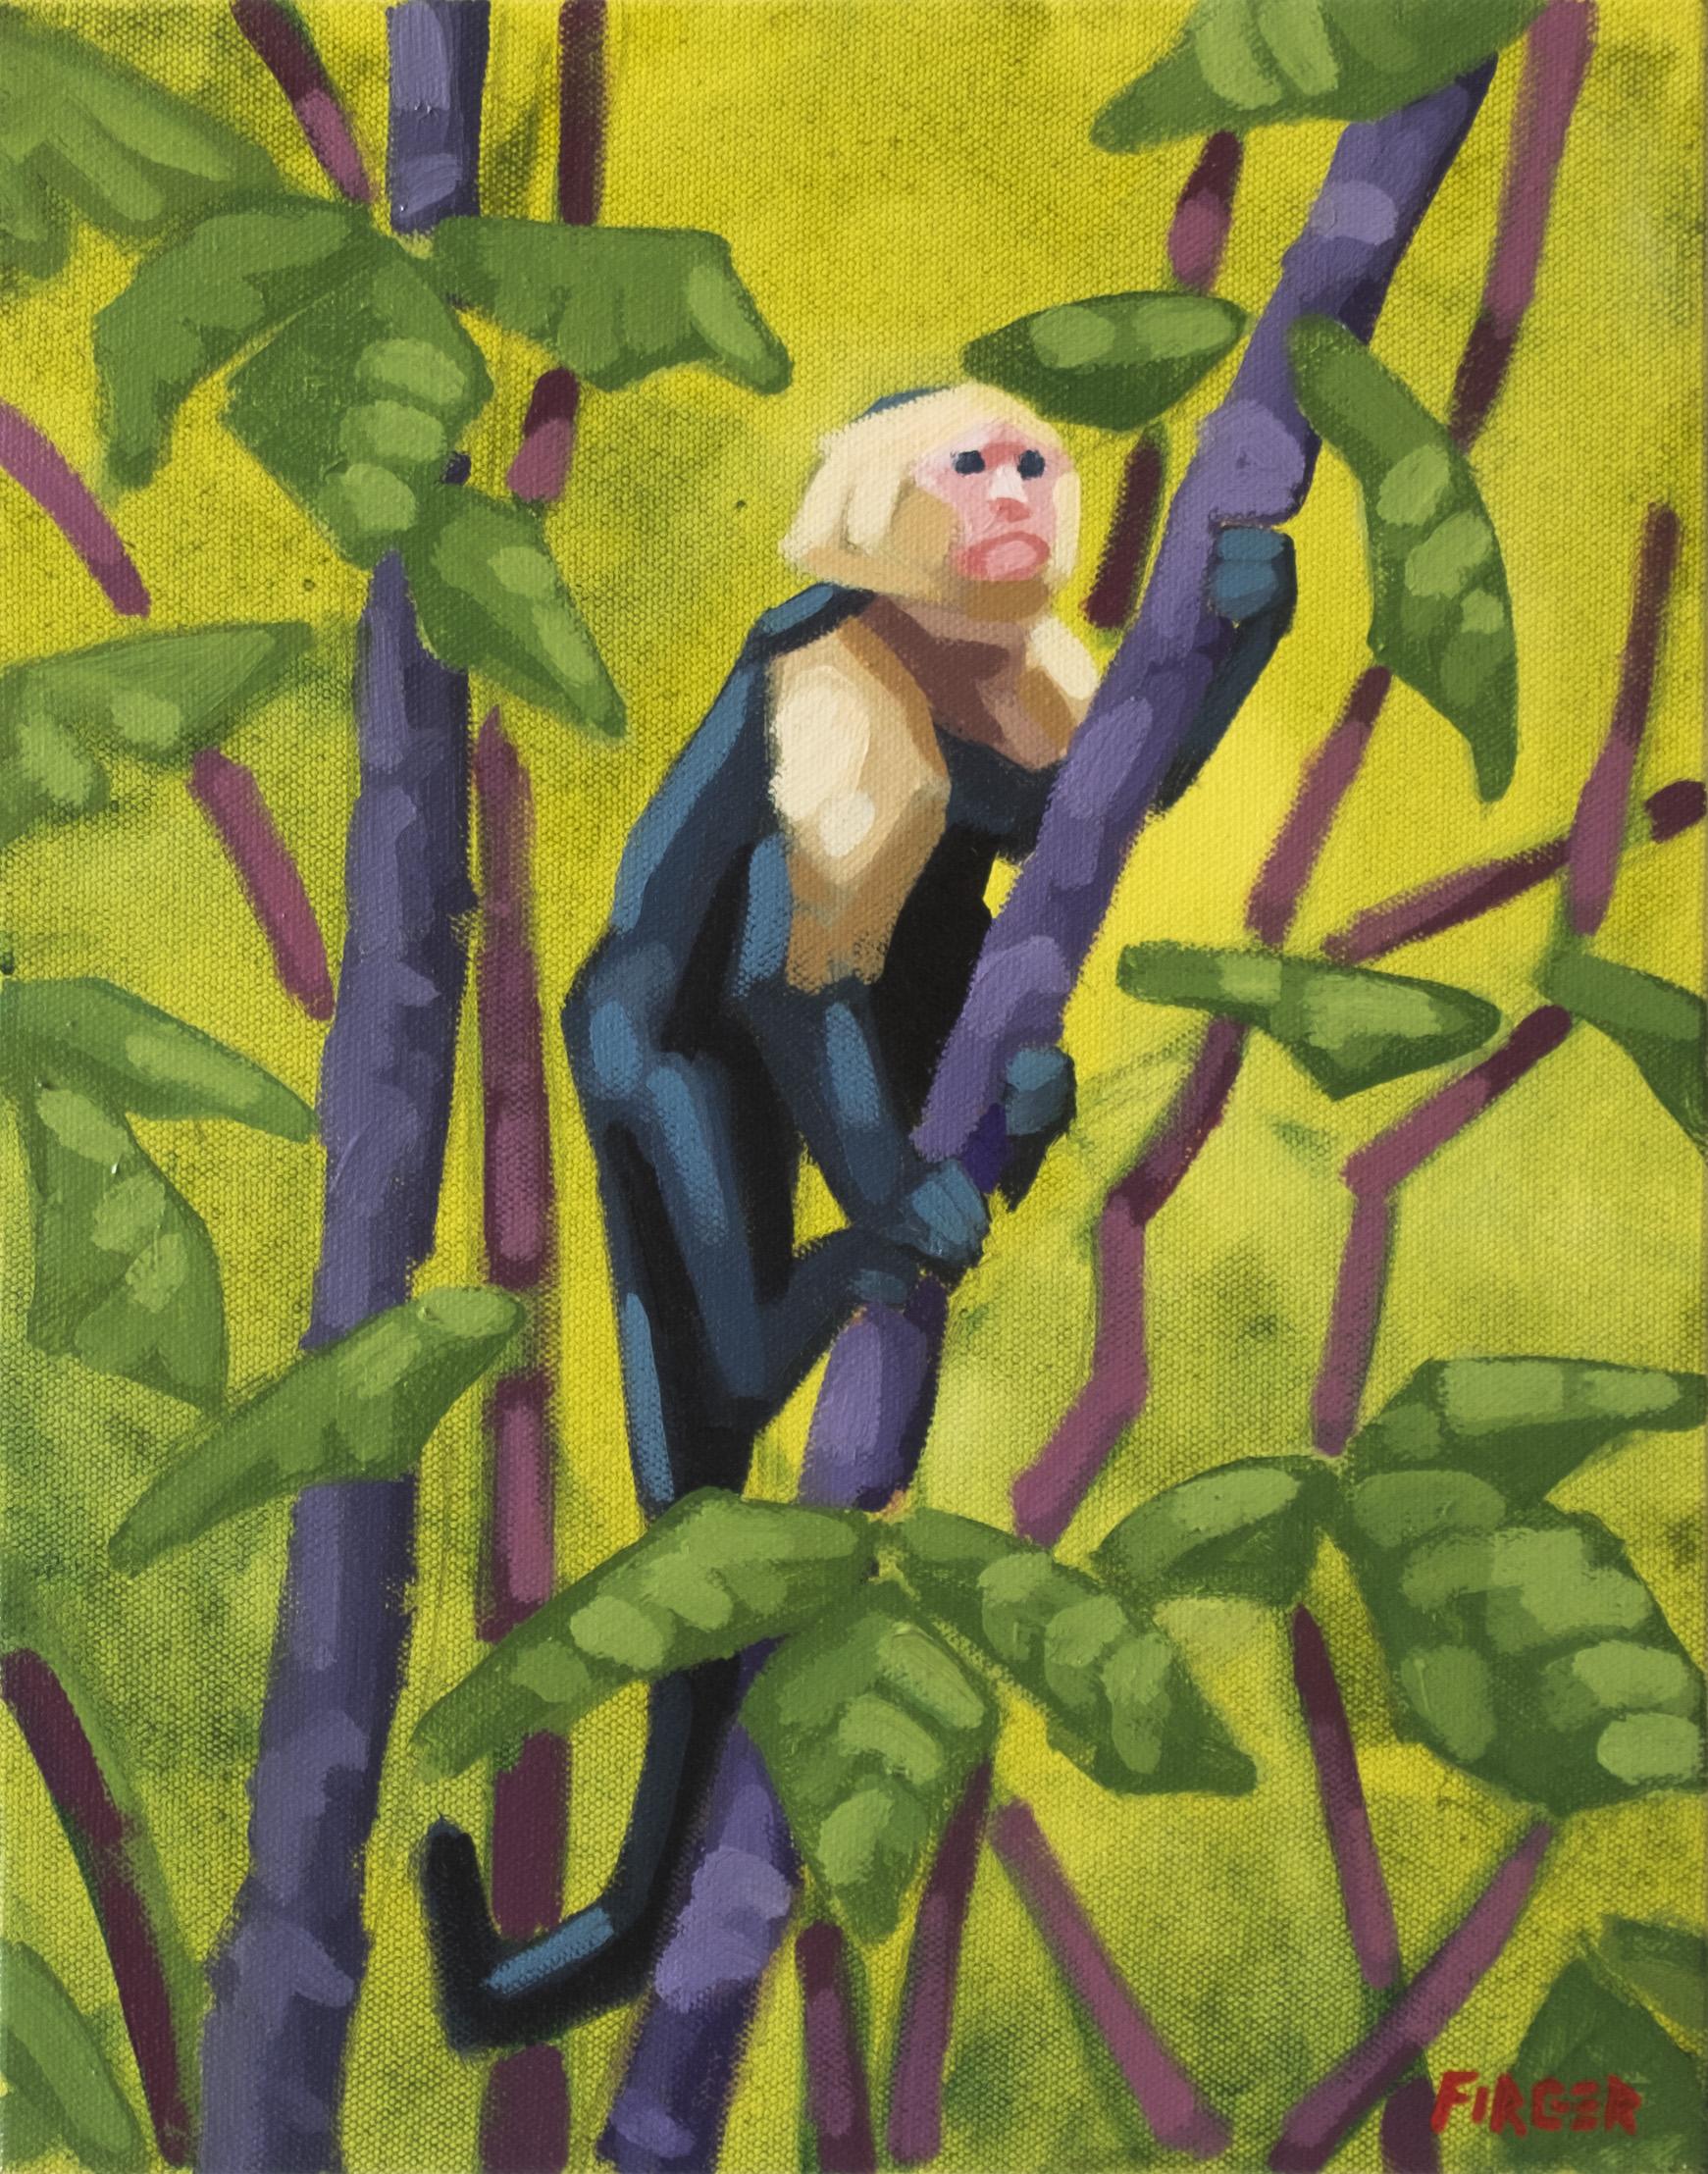 Jungle Climber II - 11 x 14, Acrylic on Canvas (SOLD)